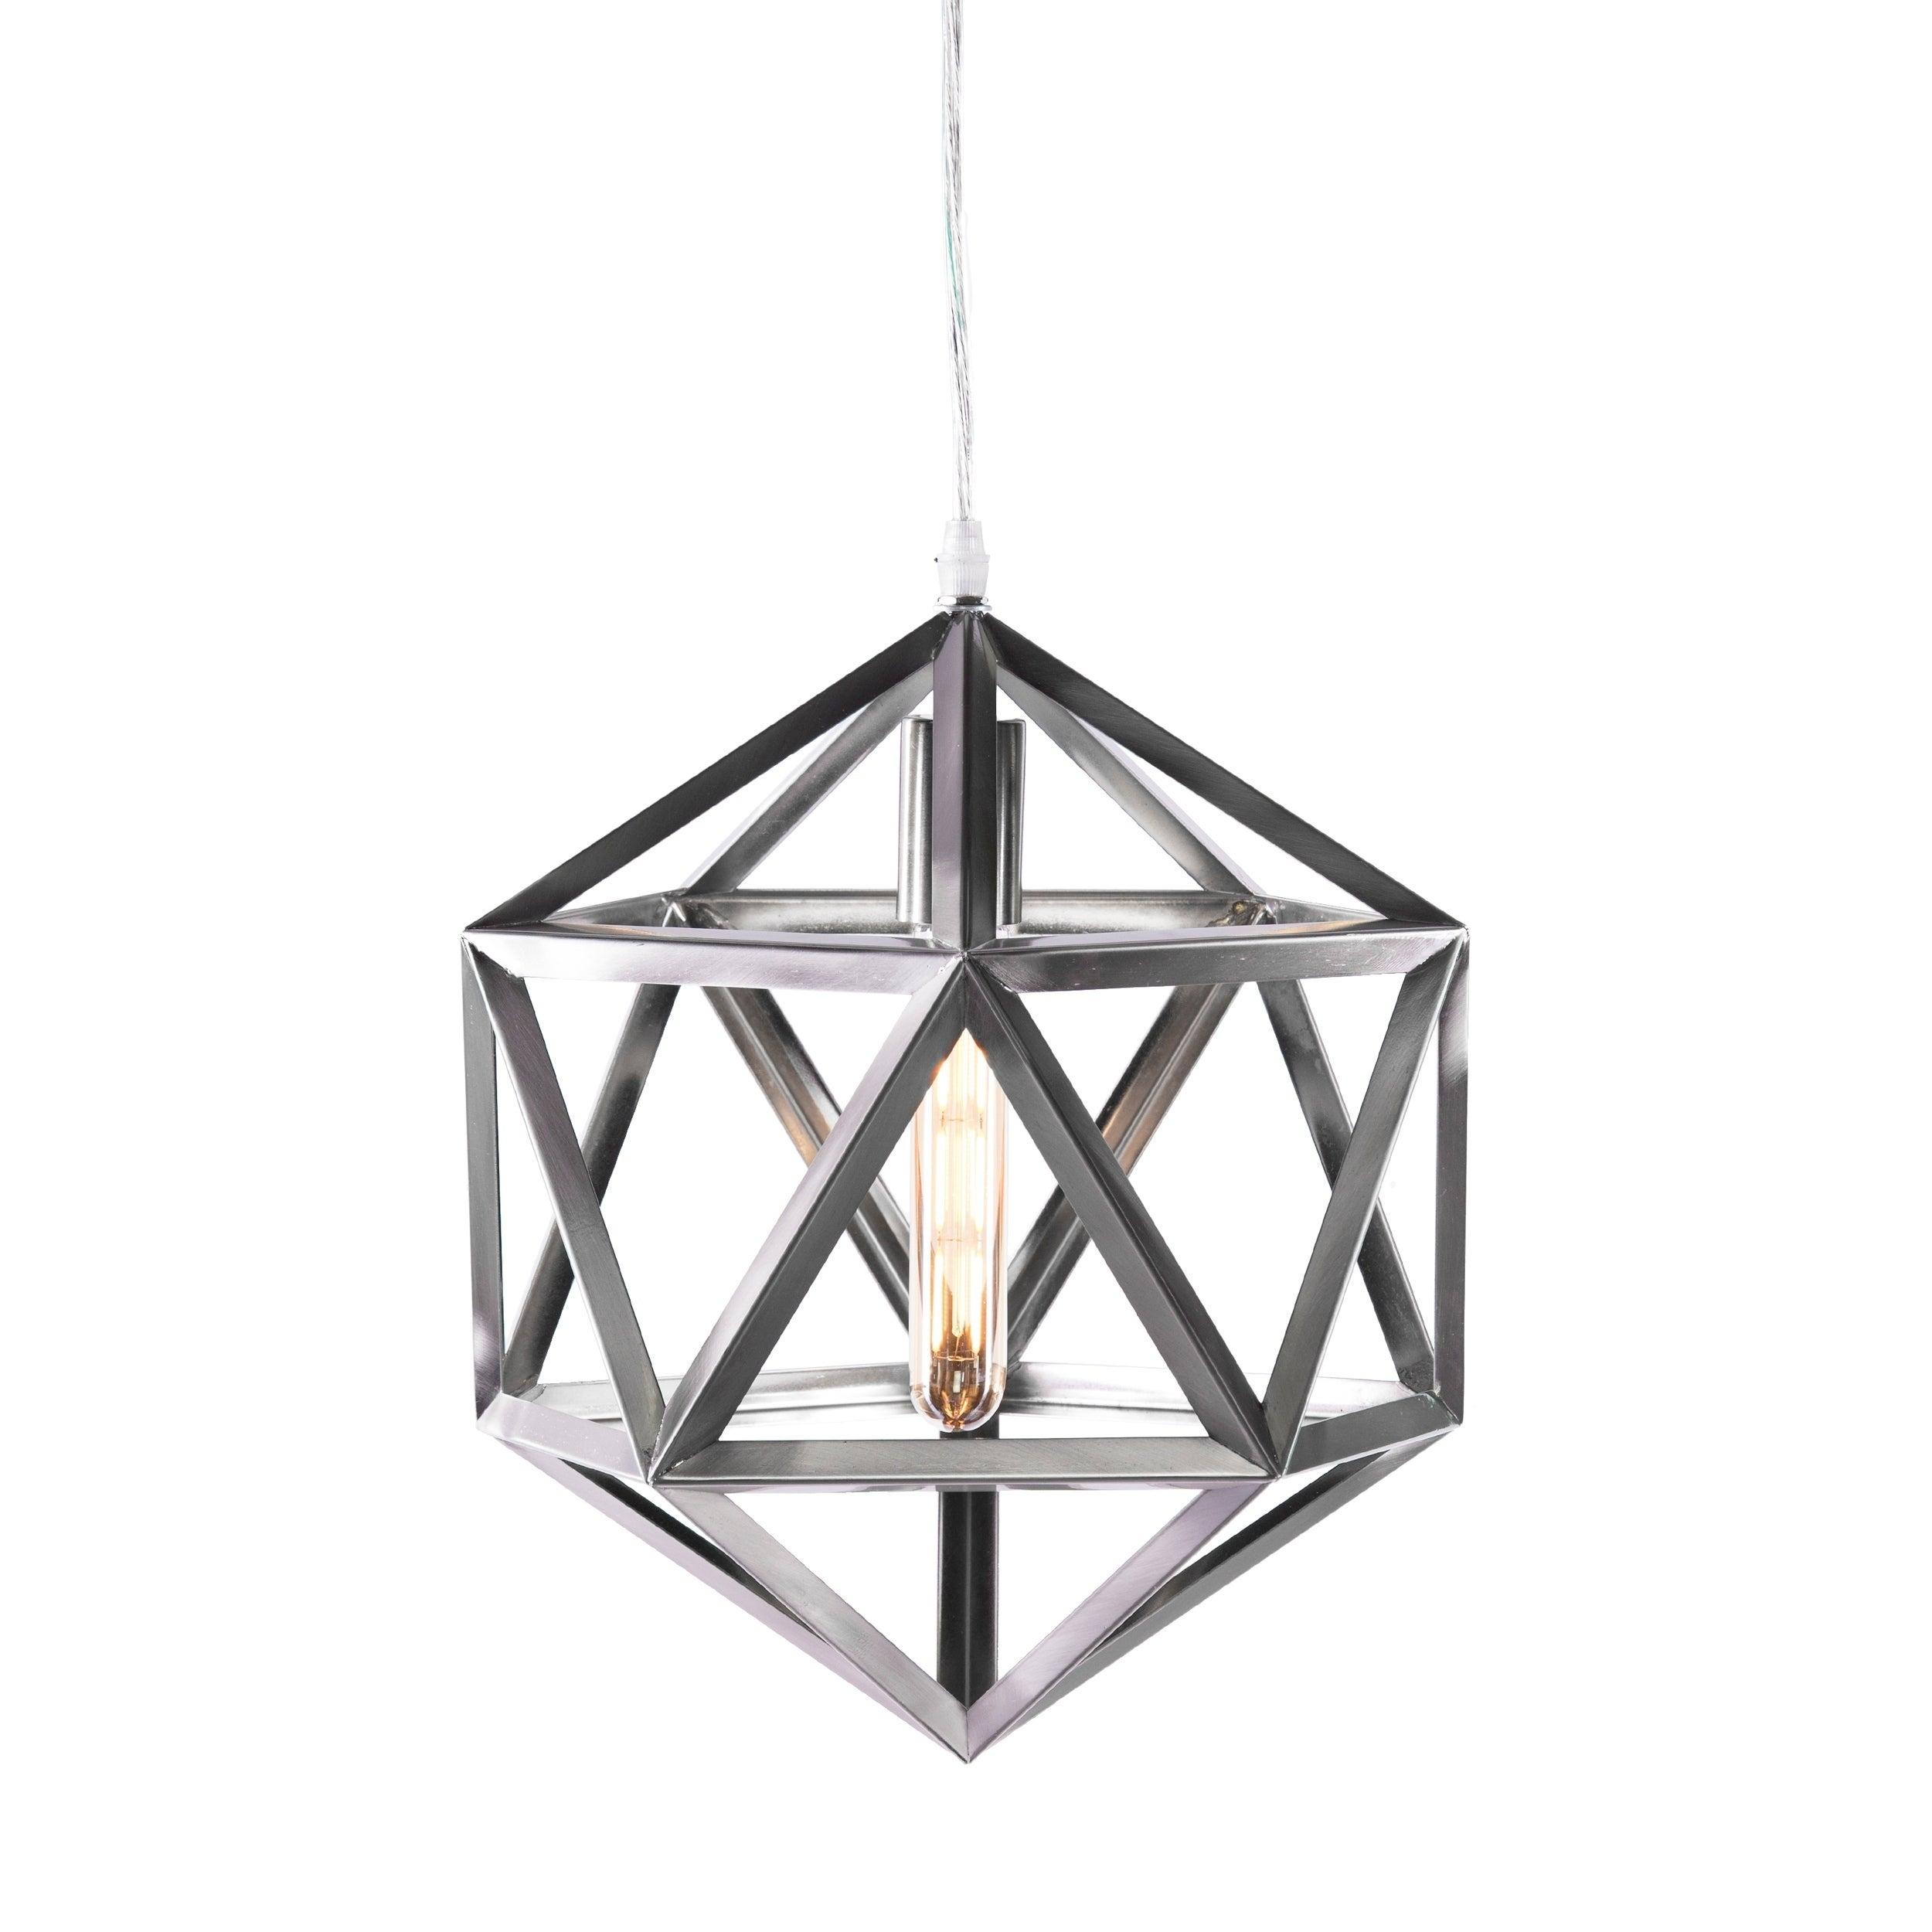 Carbon Loft Pepin Brushed Nickel Geometric Cage Pendant Lamp